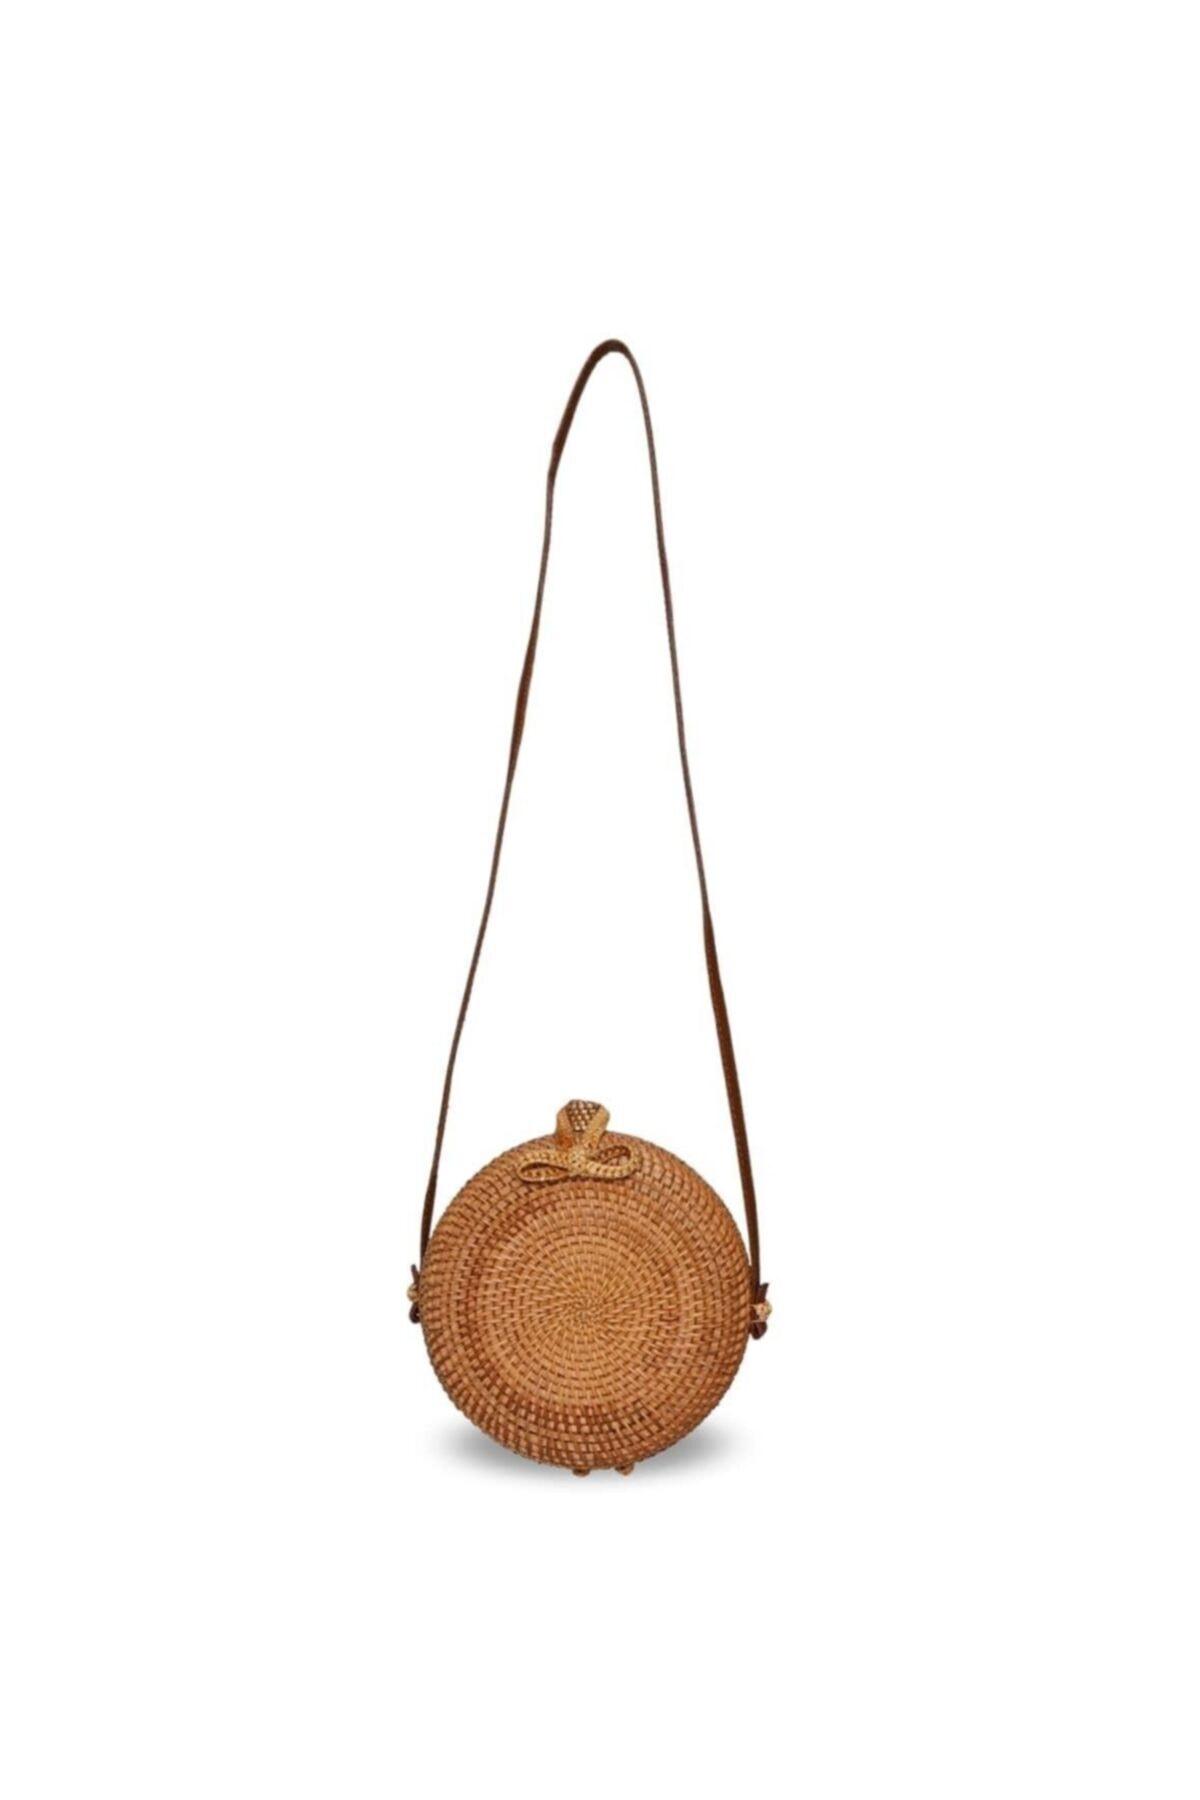 The All Brands Kadın Kahverengi Bagoist Tam Oval Rattan Çanta 20 cm 2